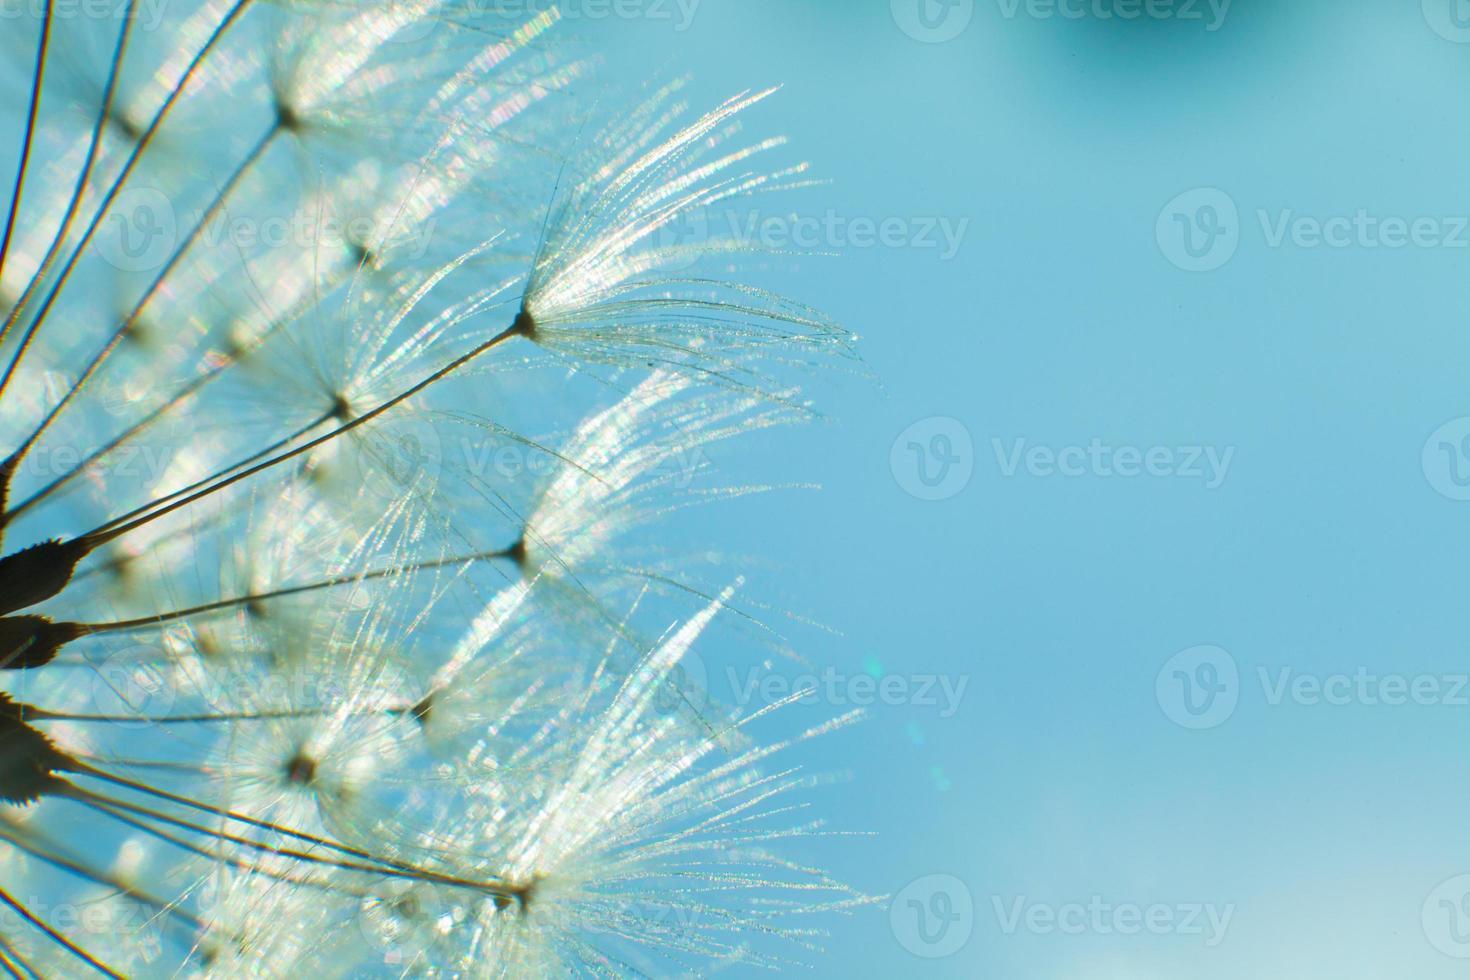 paardebloem en zaden in blauwe hemel foto